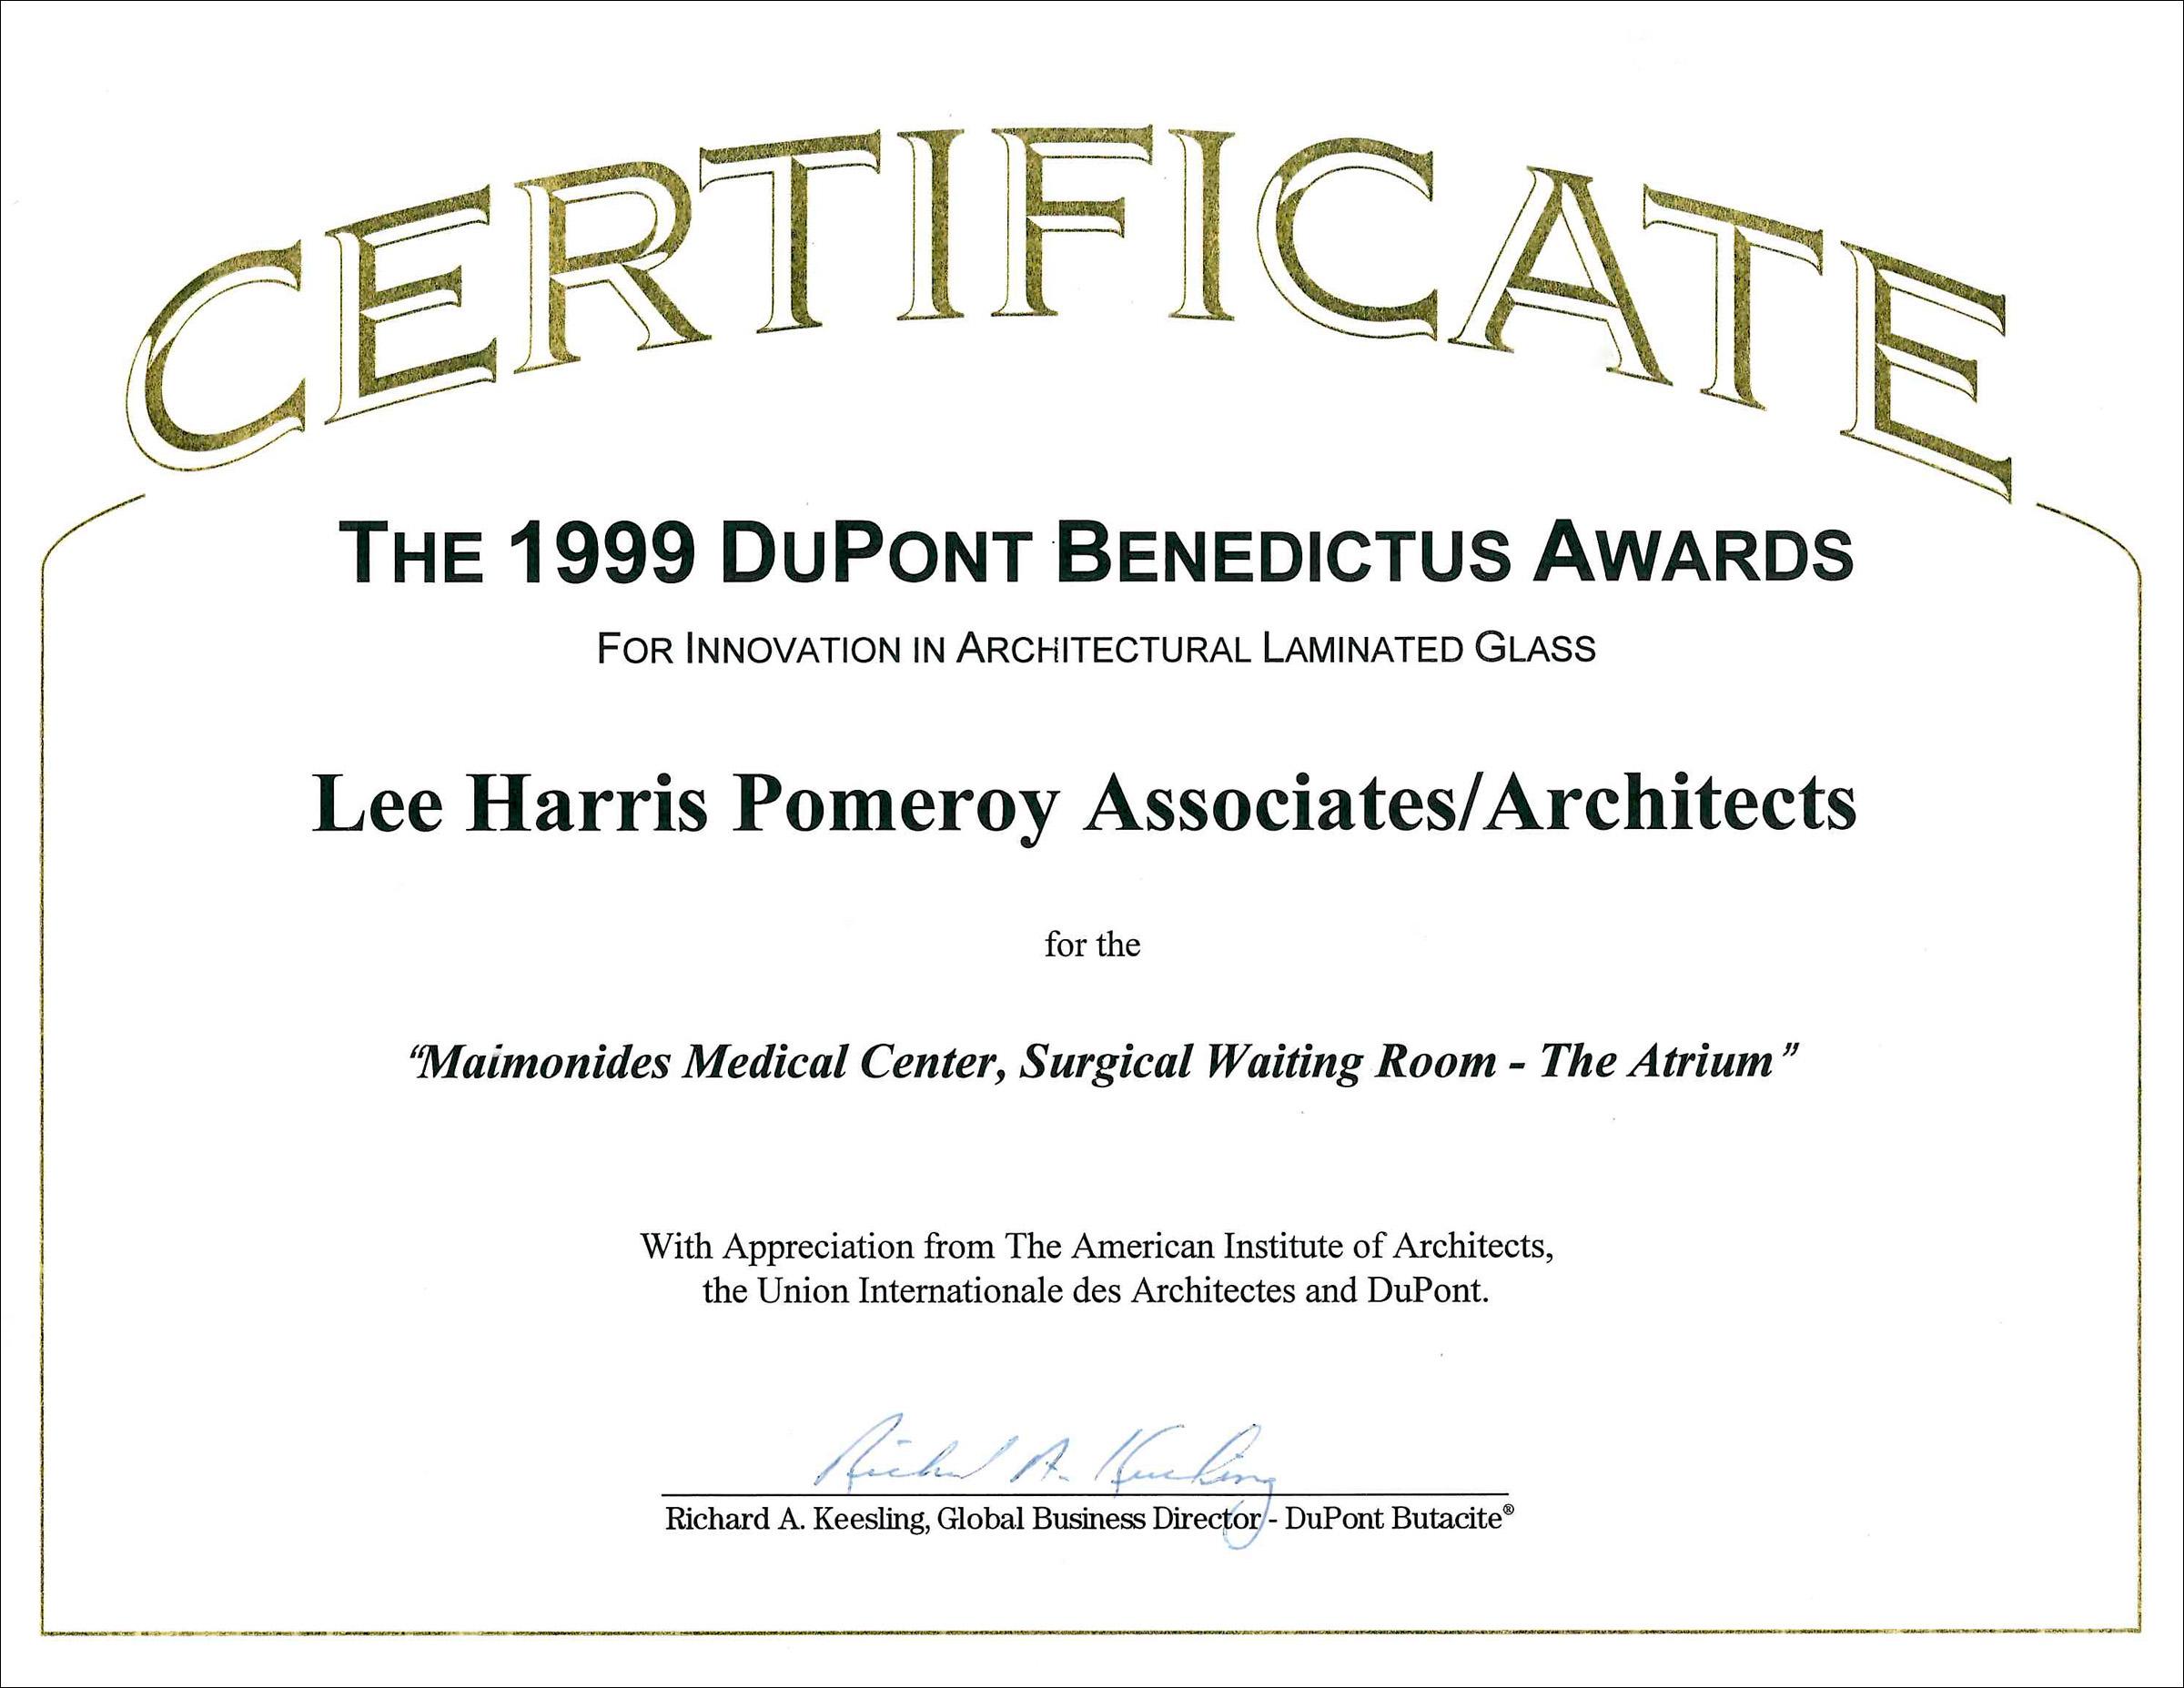 1999 DuPont Benedictus Awards Maimonides Med Ctr